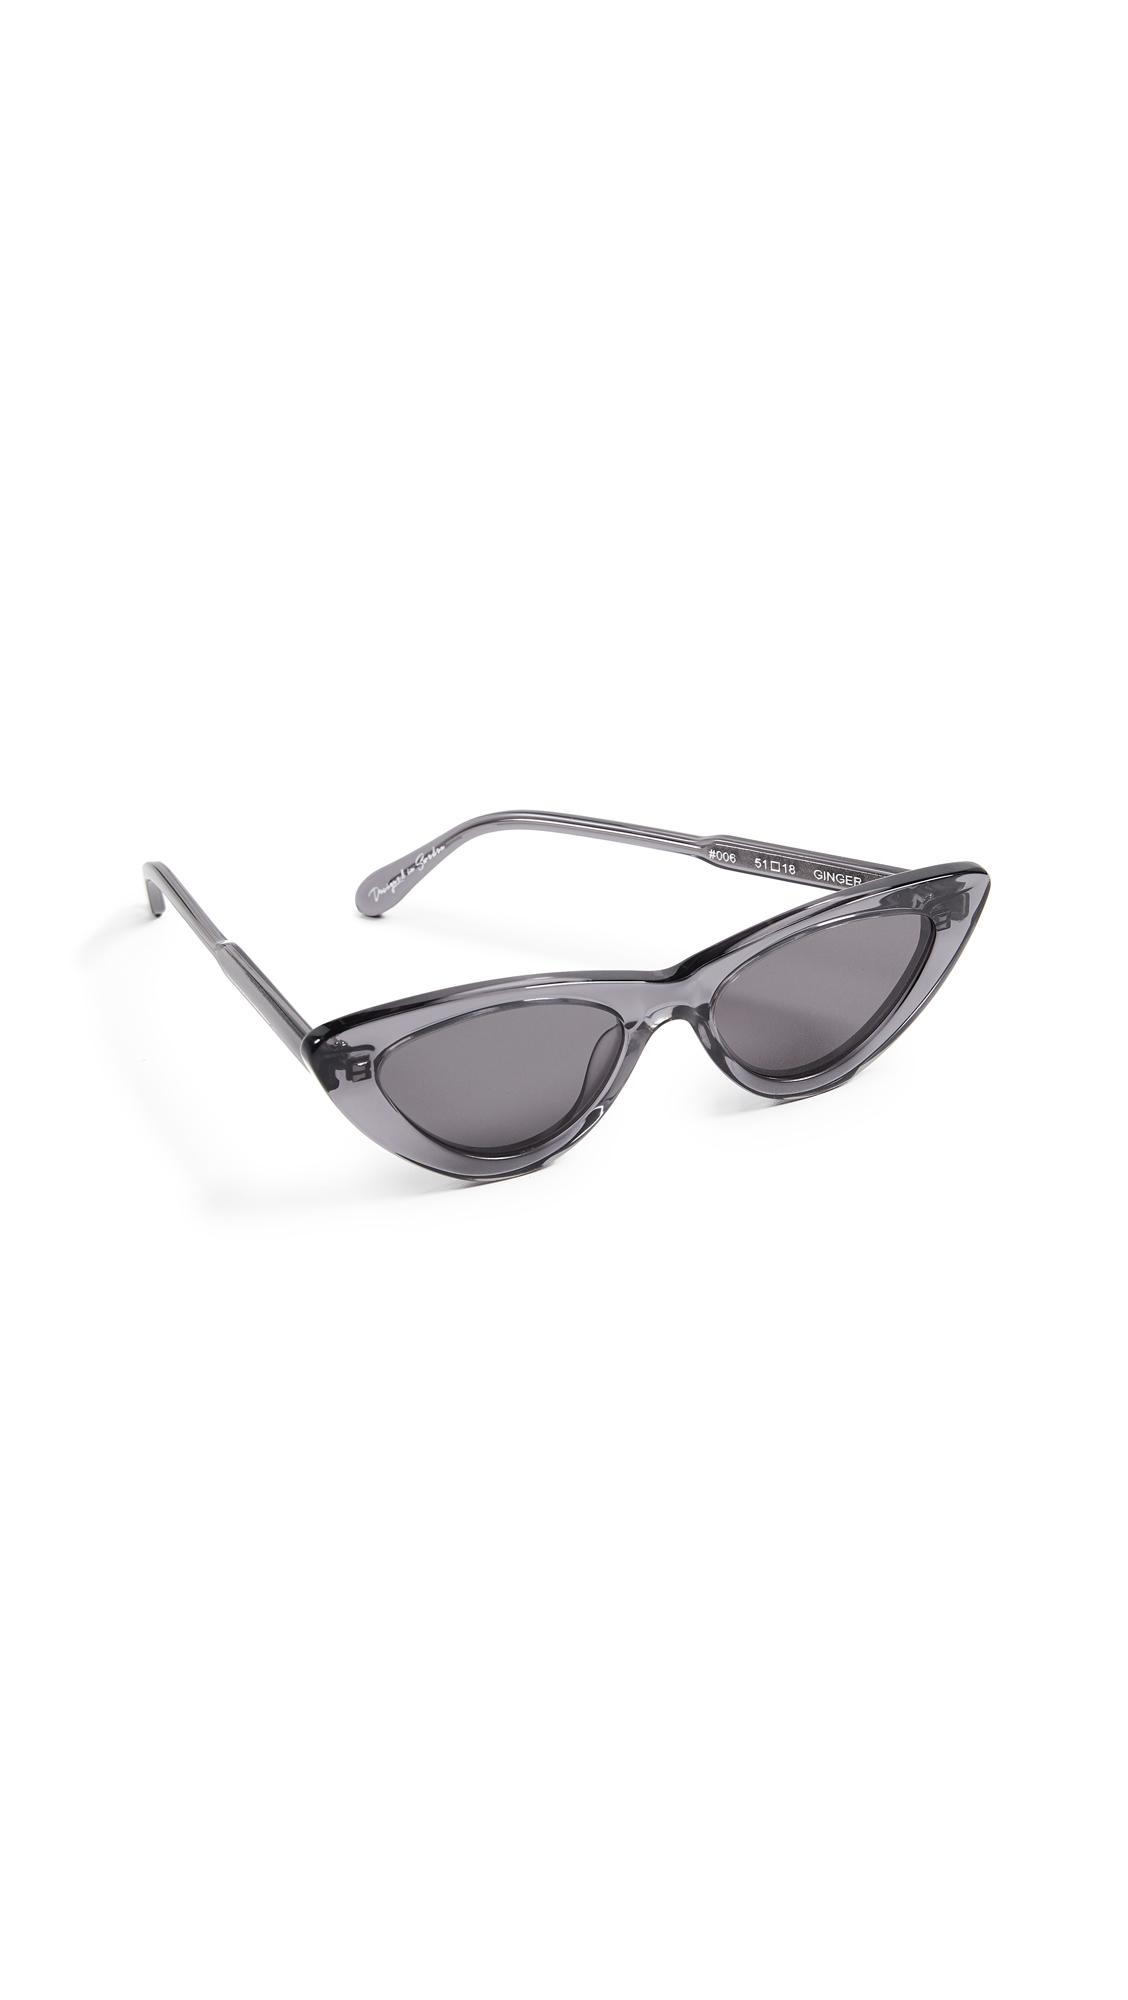 CHIMI 006 Sunglasses in Ginger